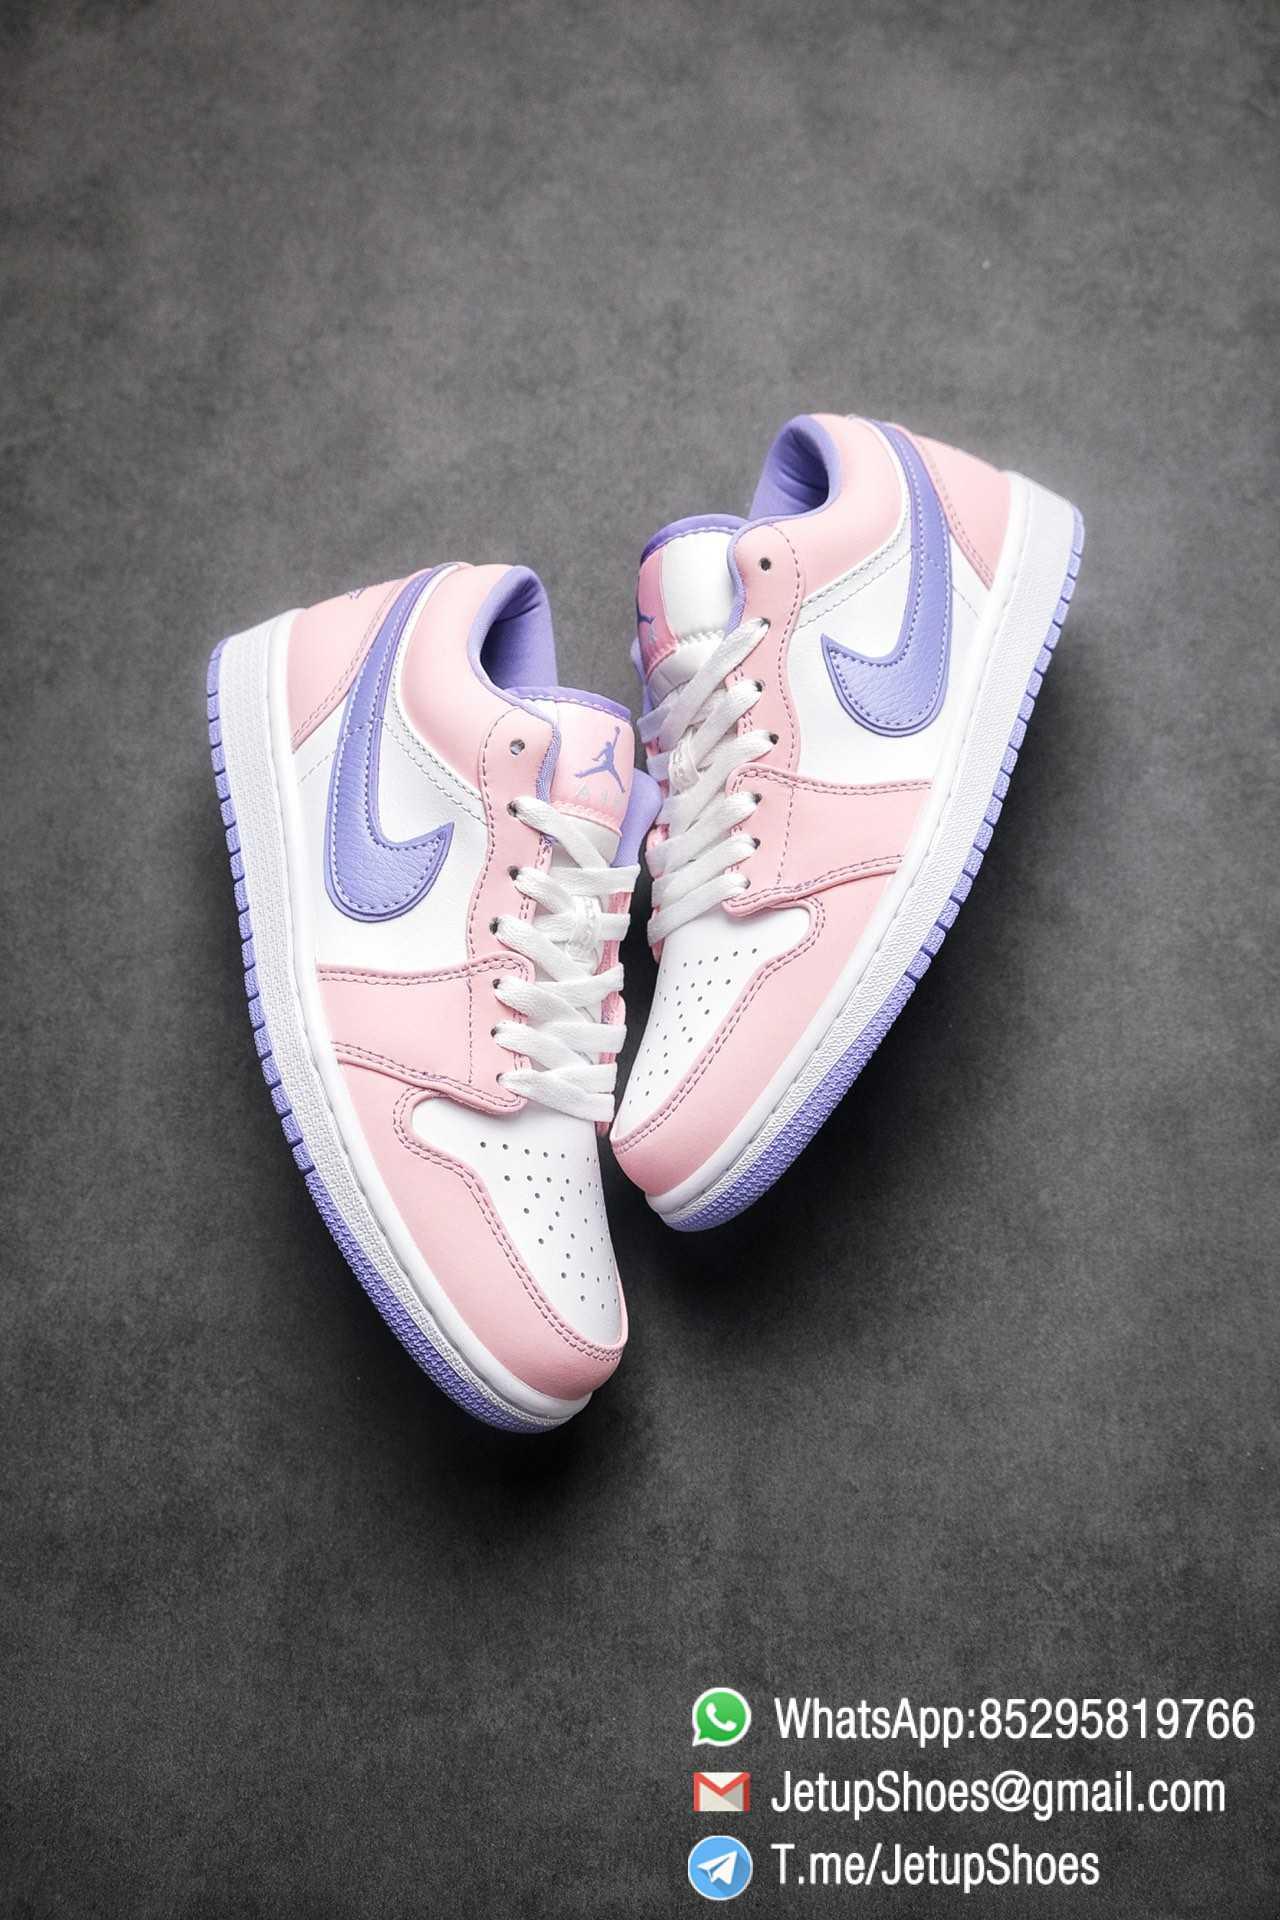 Best Replica Air Jordan 1 Low SE Arctic Punch Crisp White Upper Soft Pink Overlays Top Quality Supplier 03